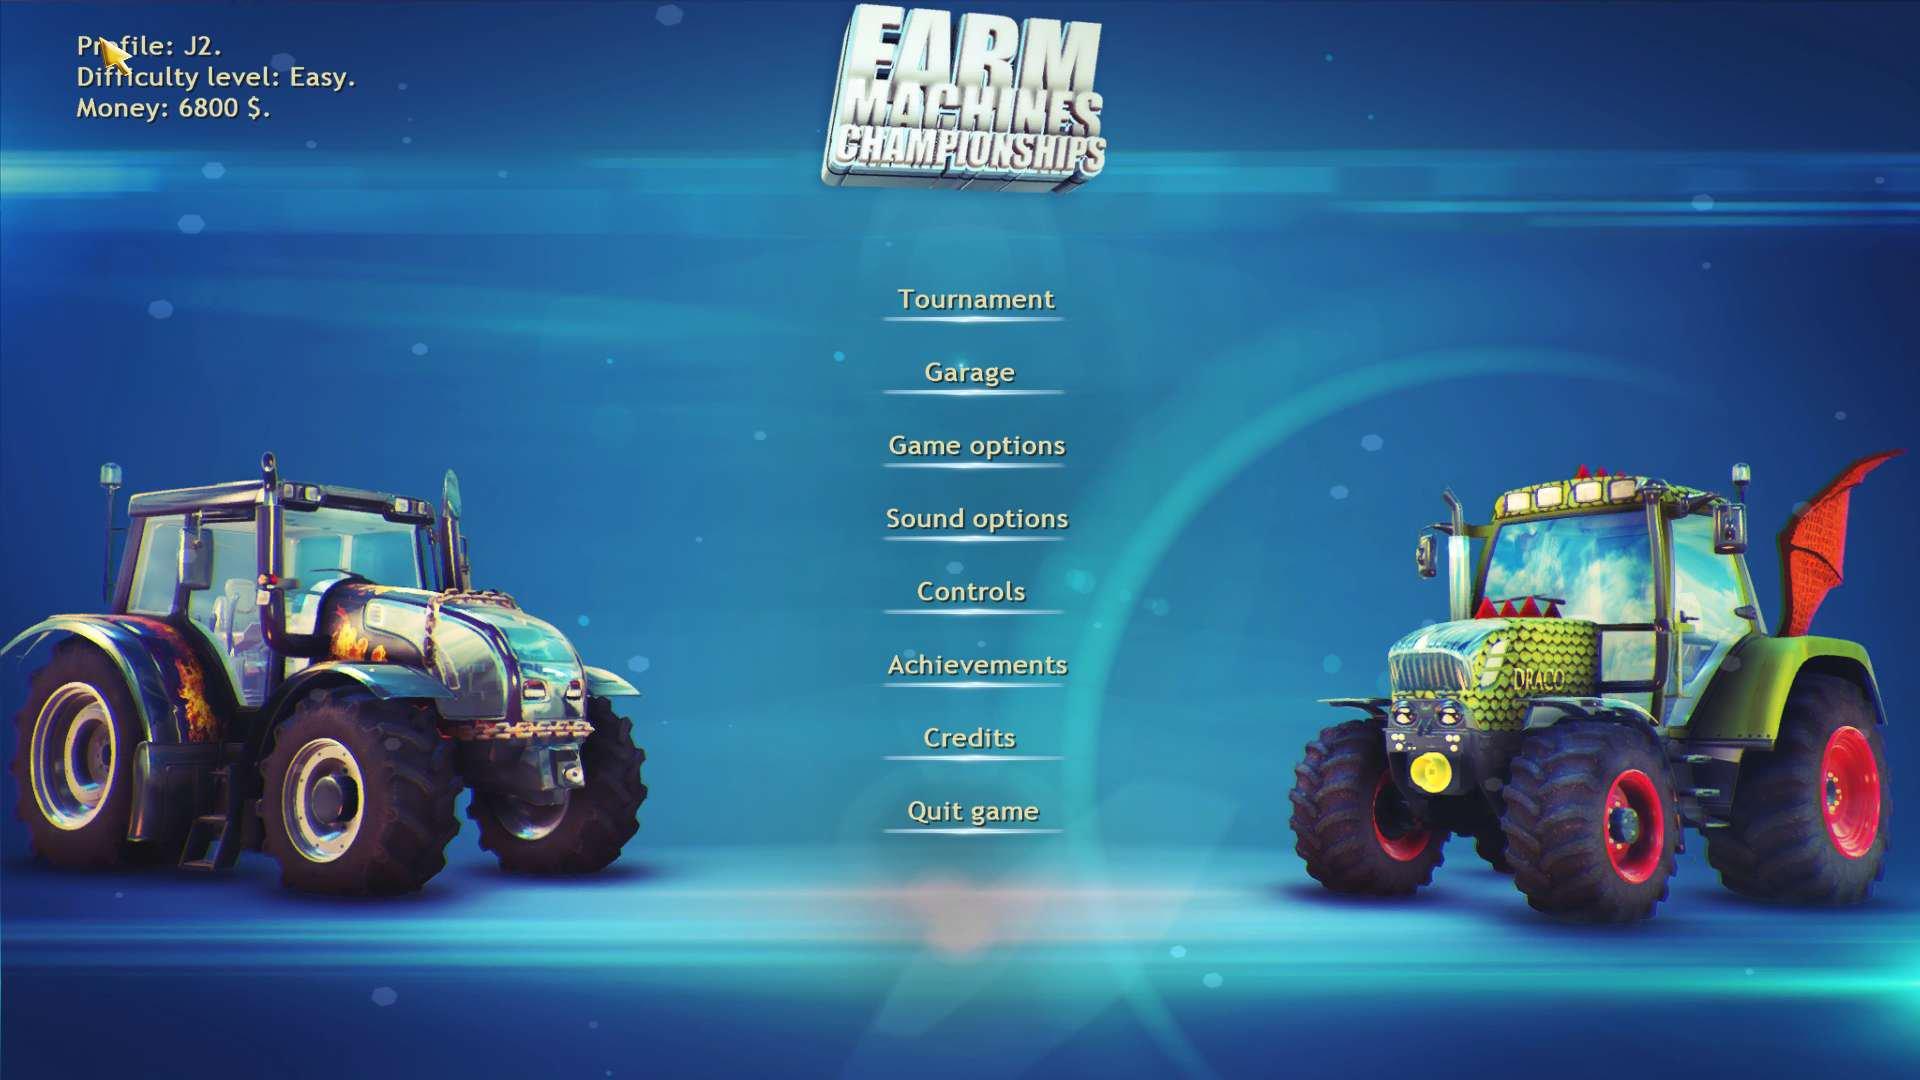 Farm Machines Championships 2014 10